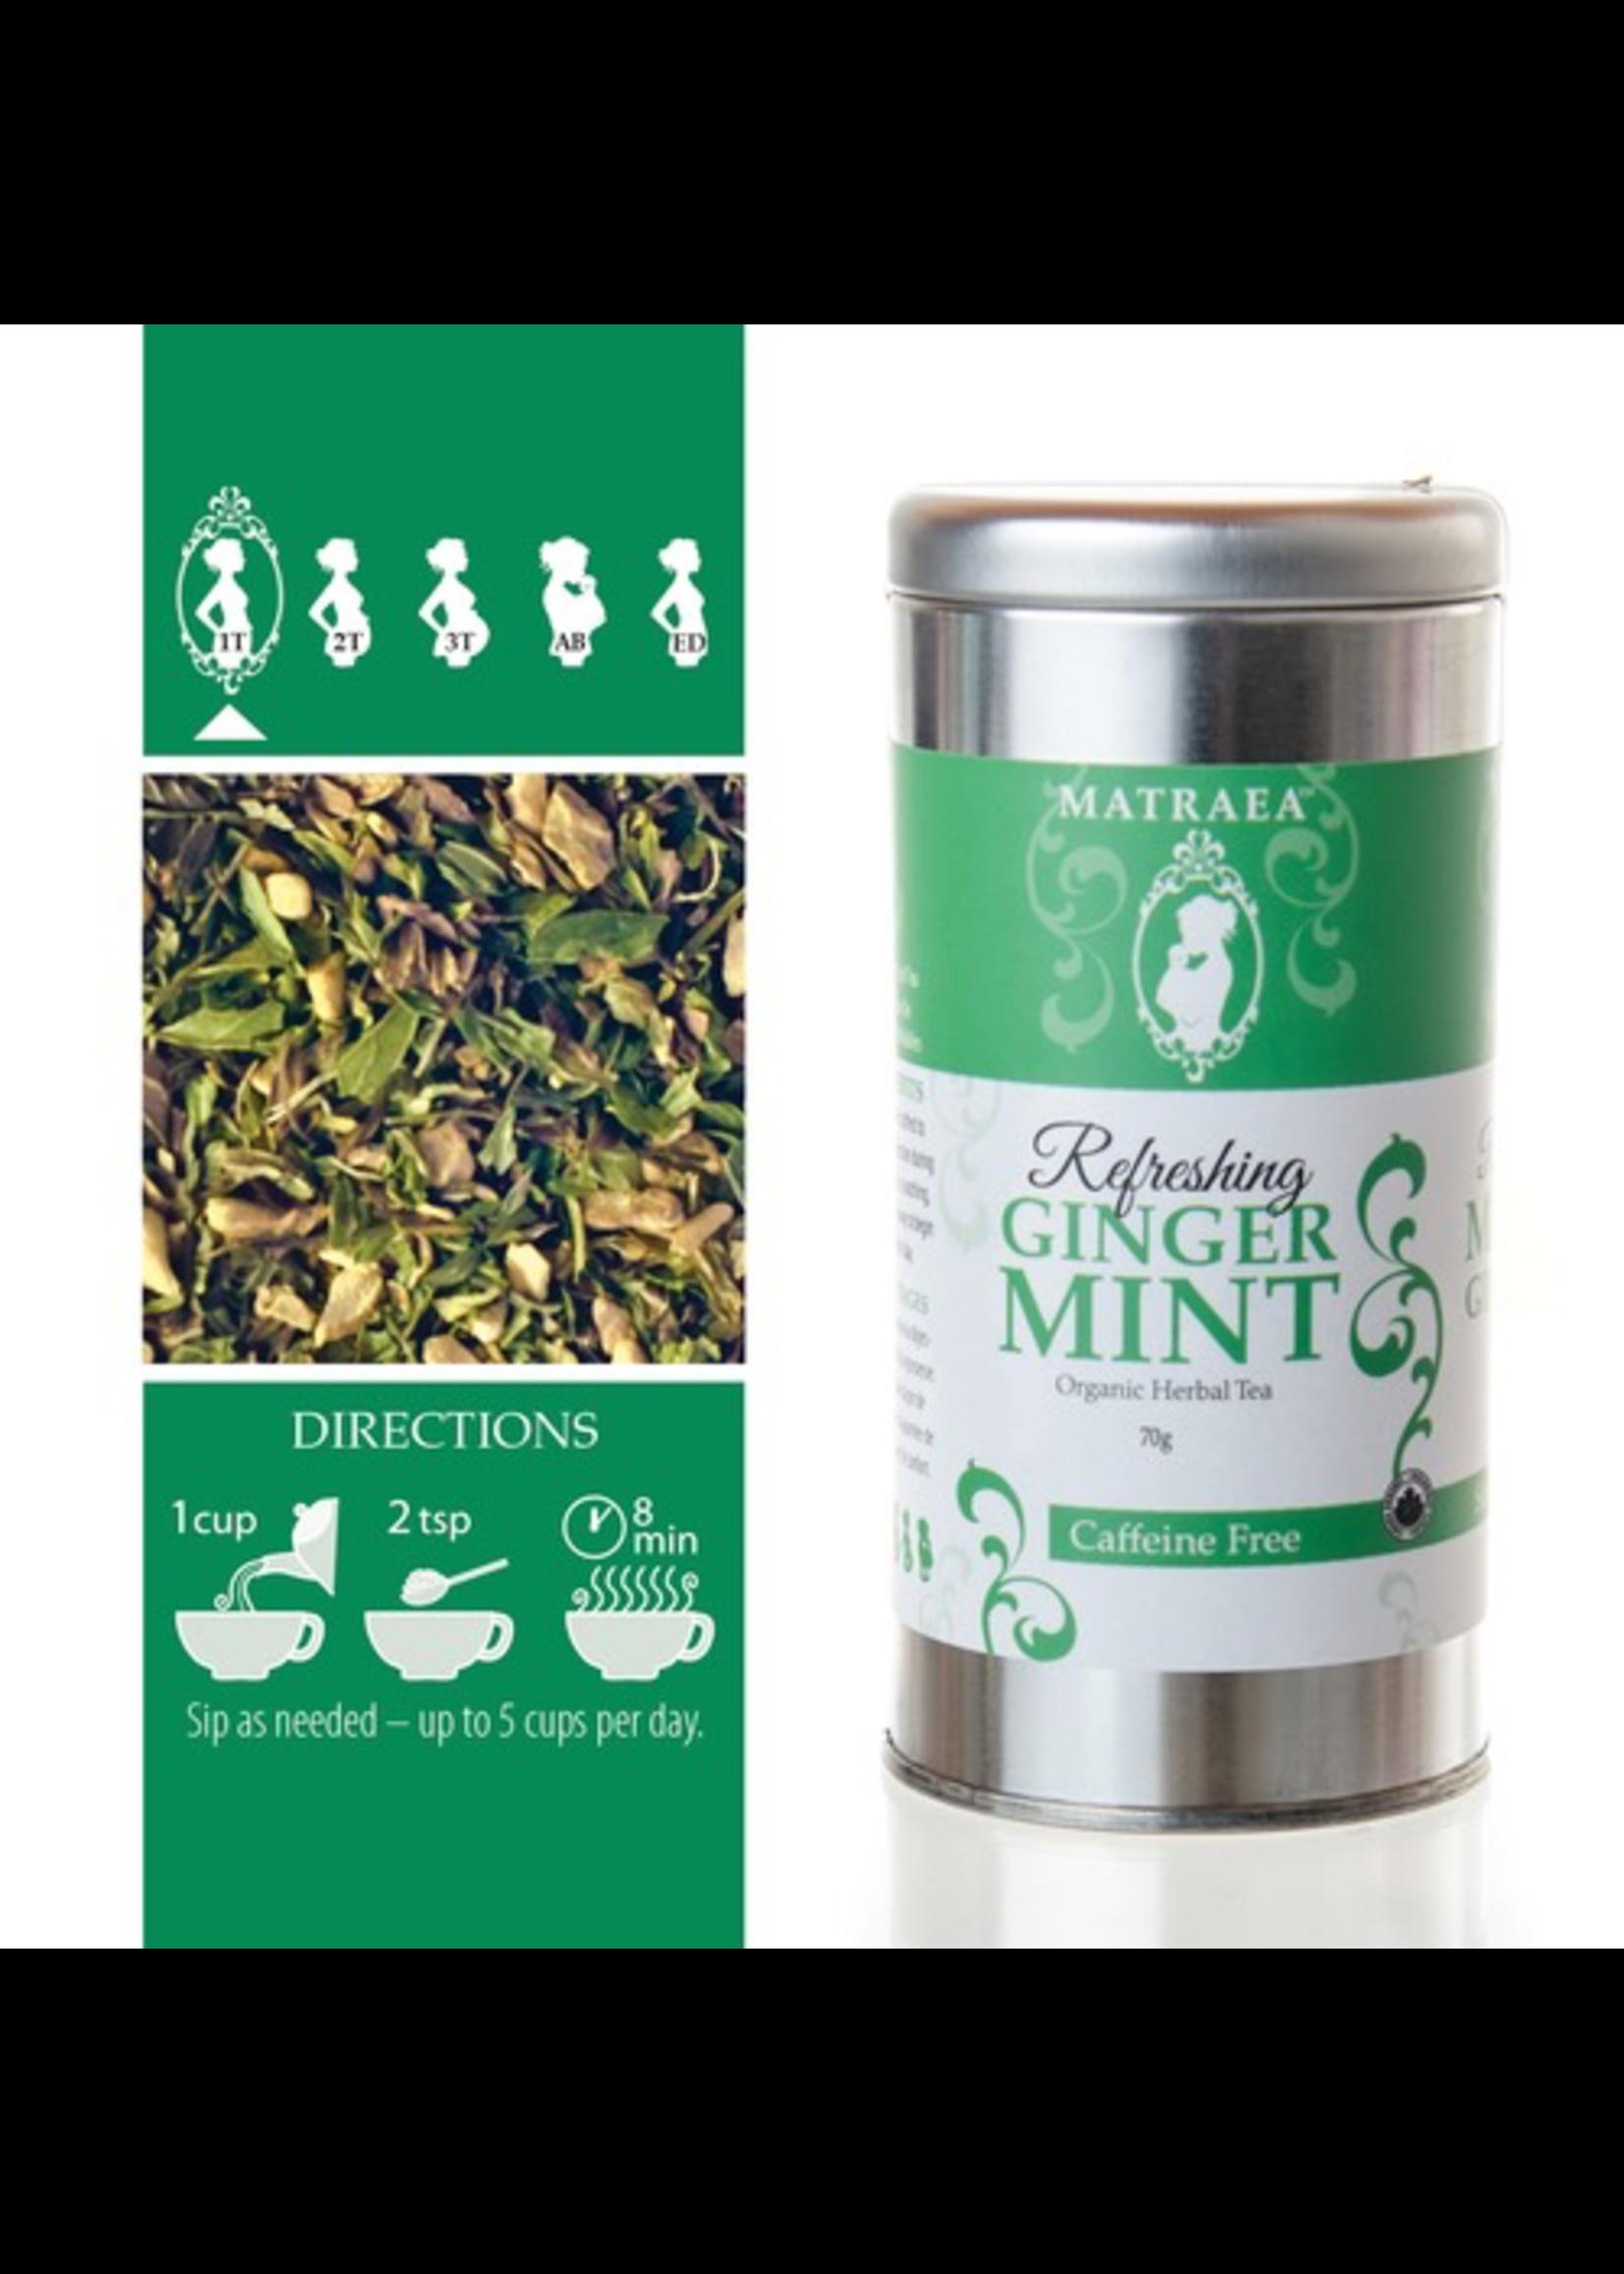 Matraea Matraea, Refreshing Ginger Mint Tea 50g